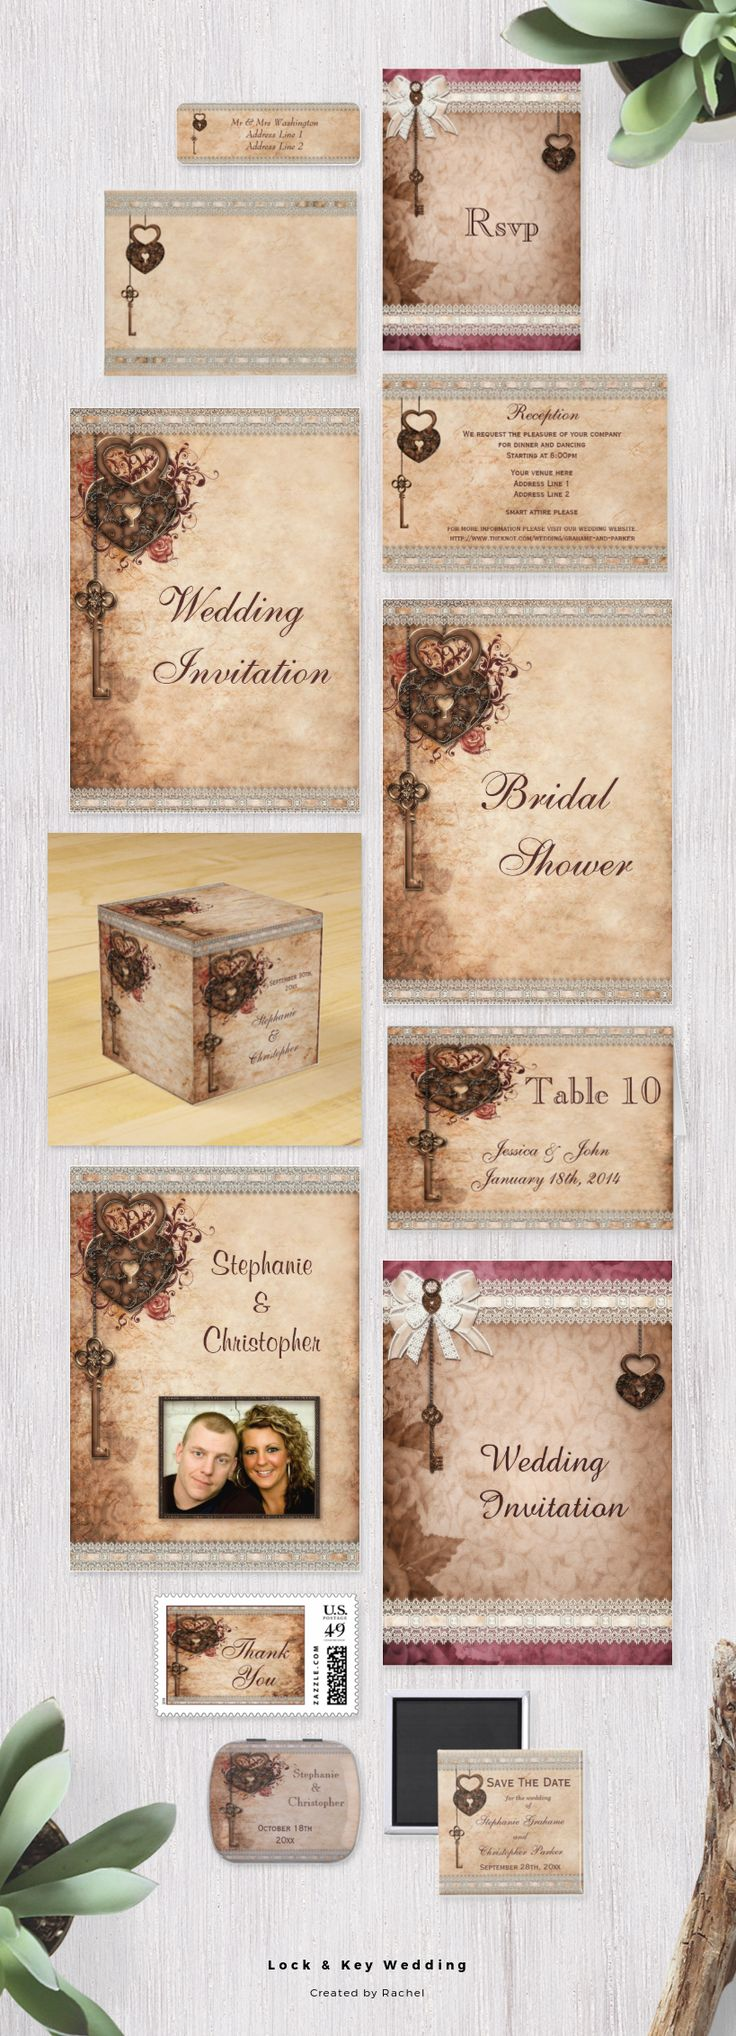 birthday invitation card in hindi%0A Elegant fall themed key and locks wedding invitations and favors Shabby  chic  classy